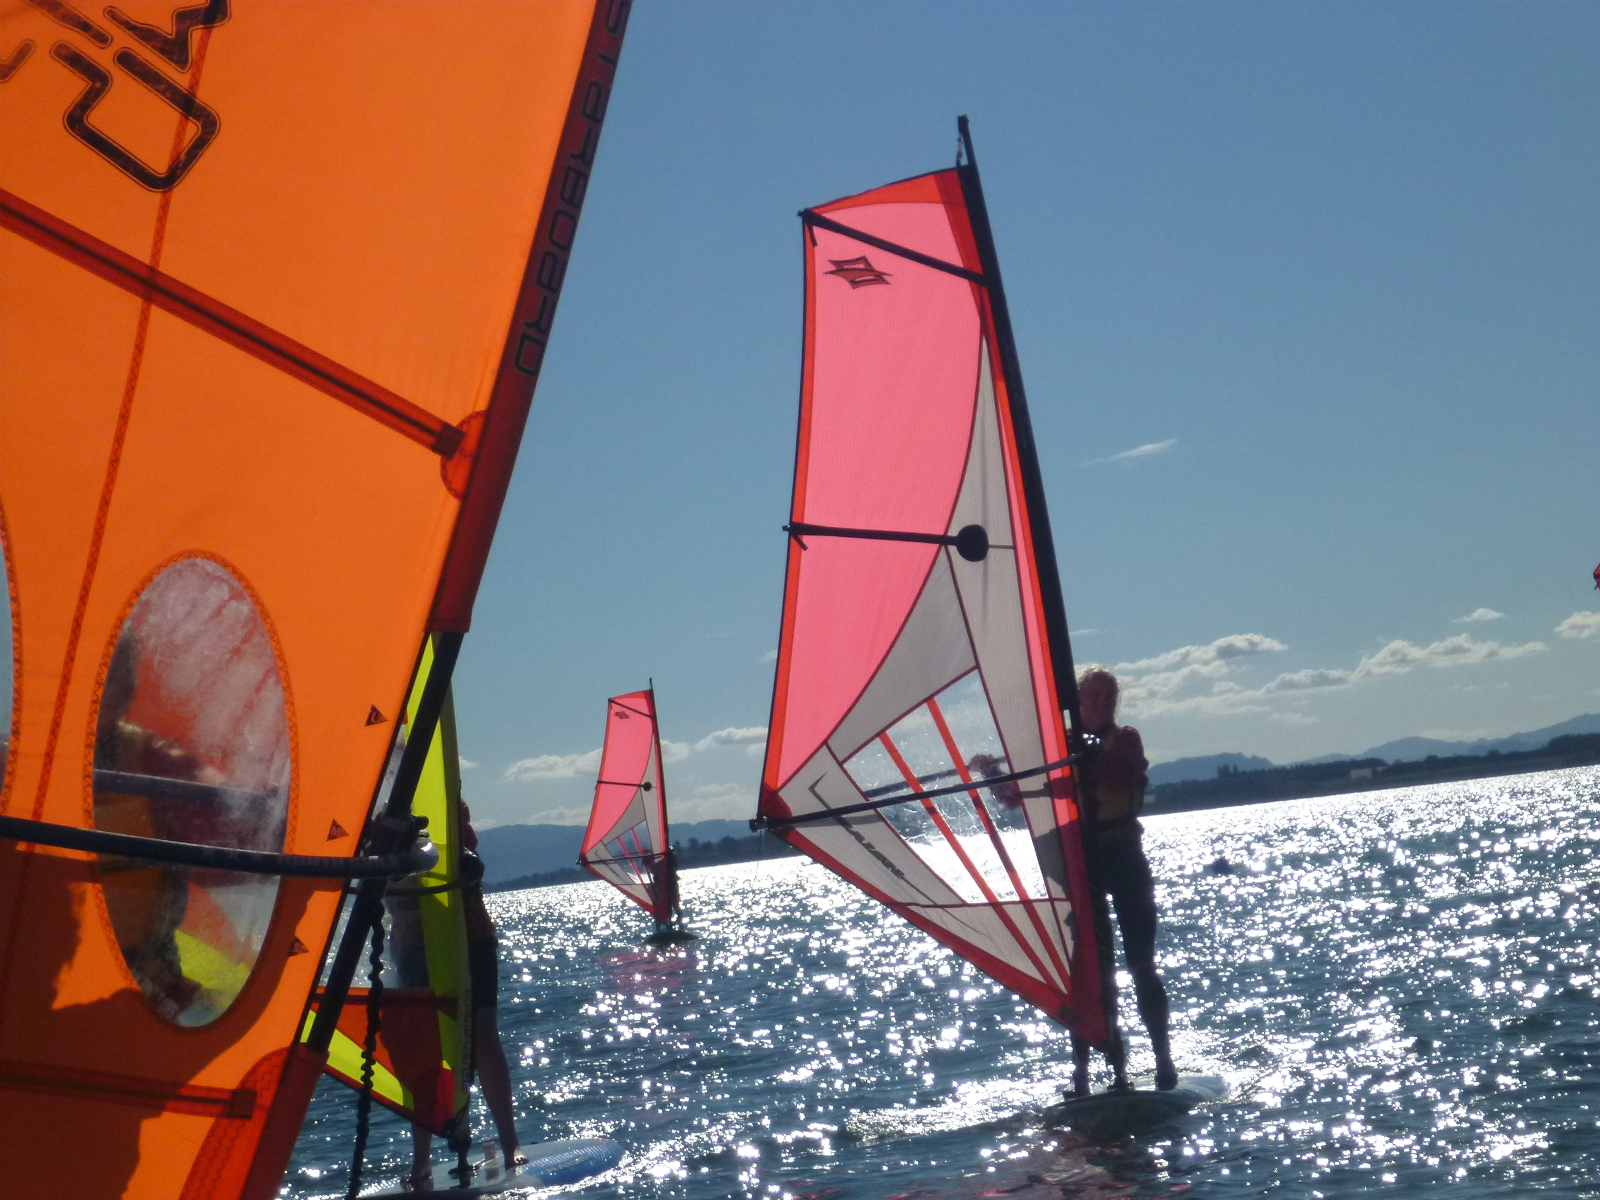 Kids love to learn to windsurf